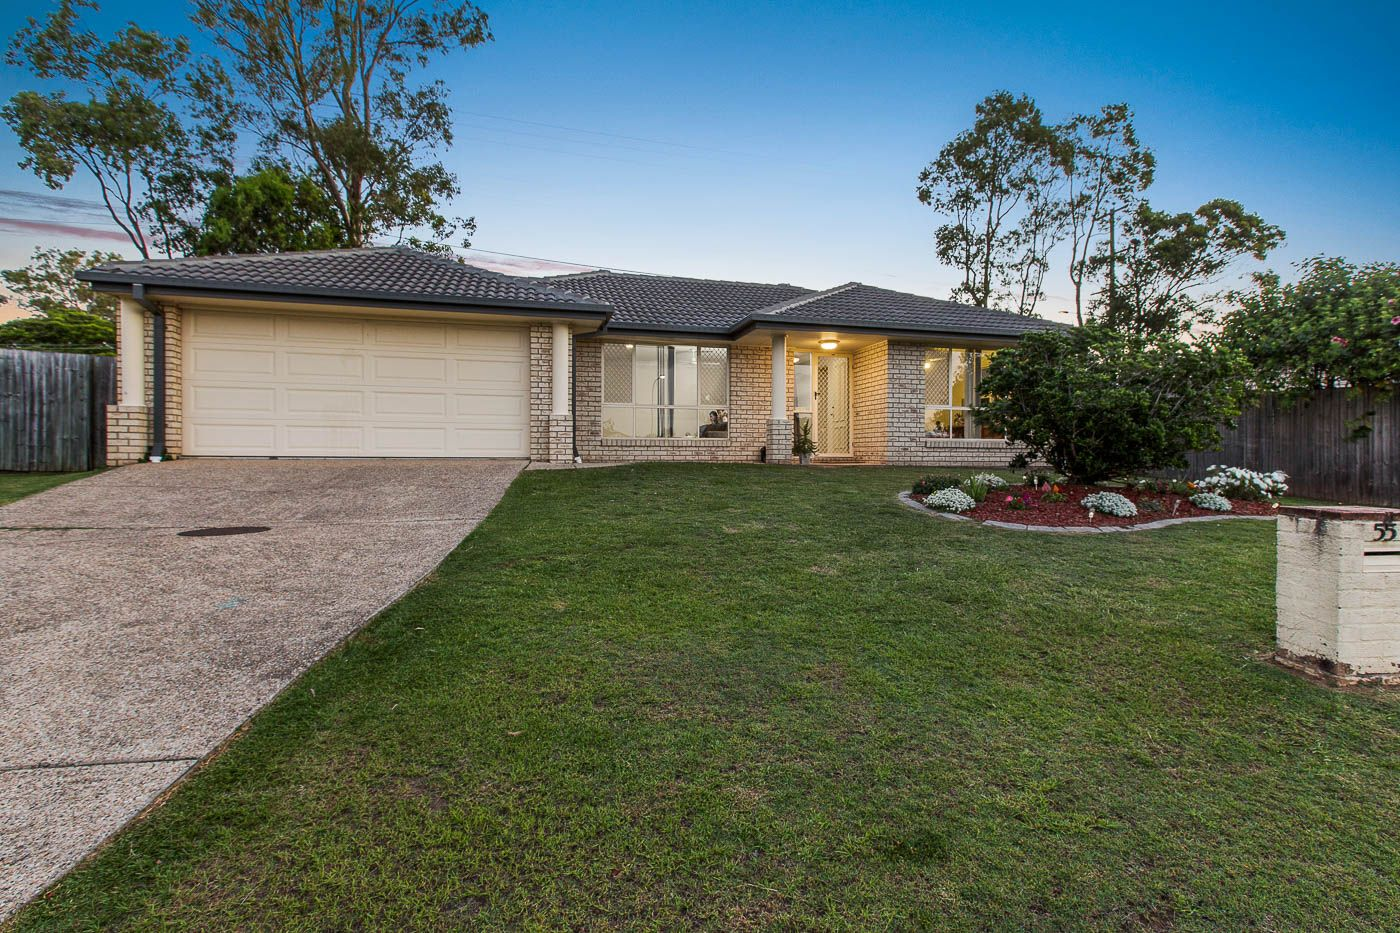 55 Pedder Street, Marsden QLD 4132, Image 1